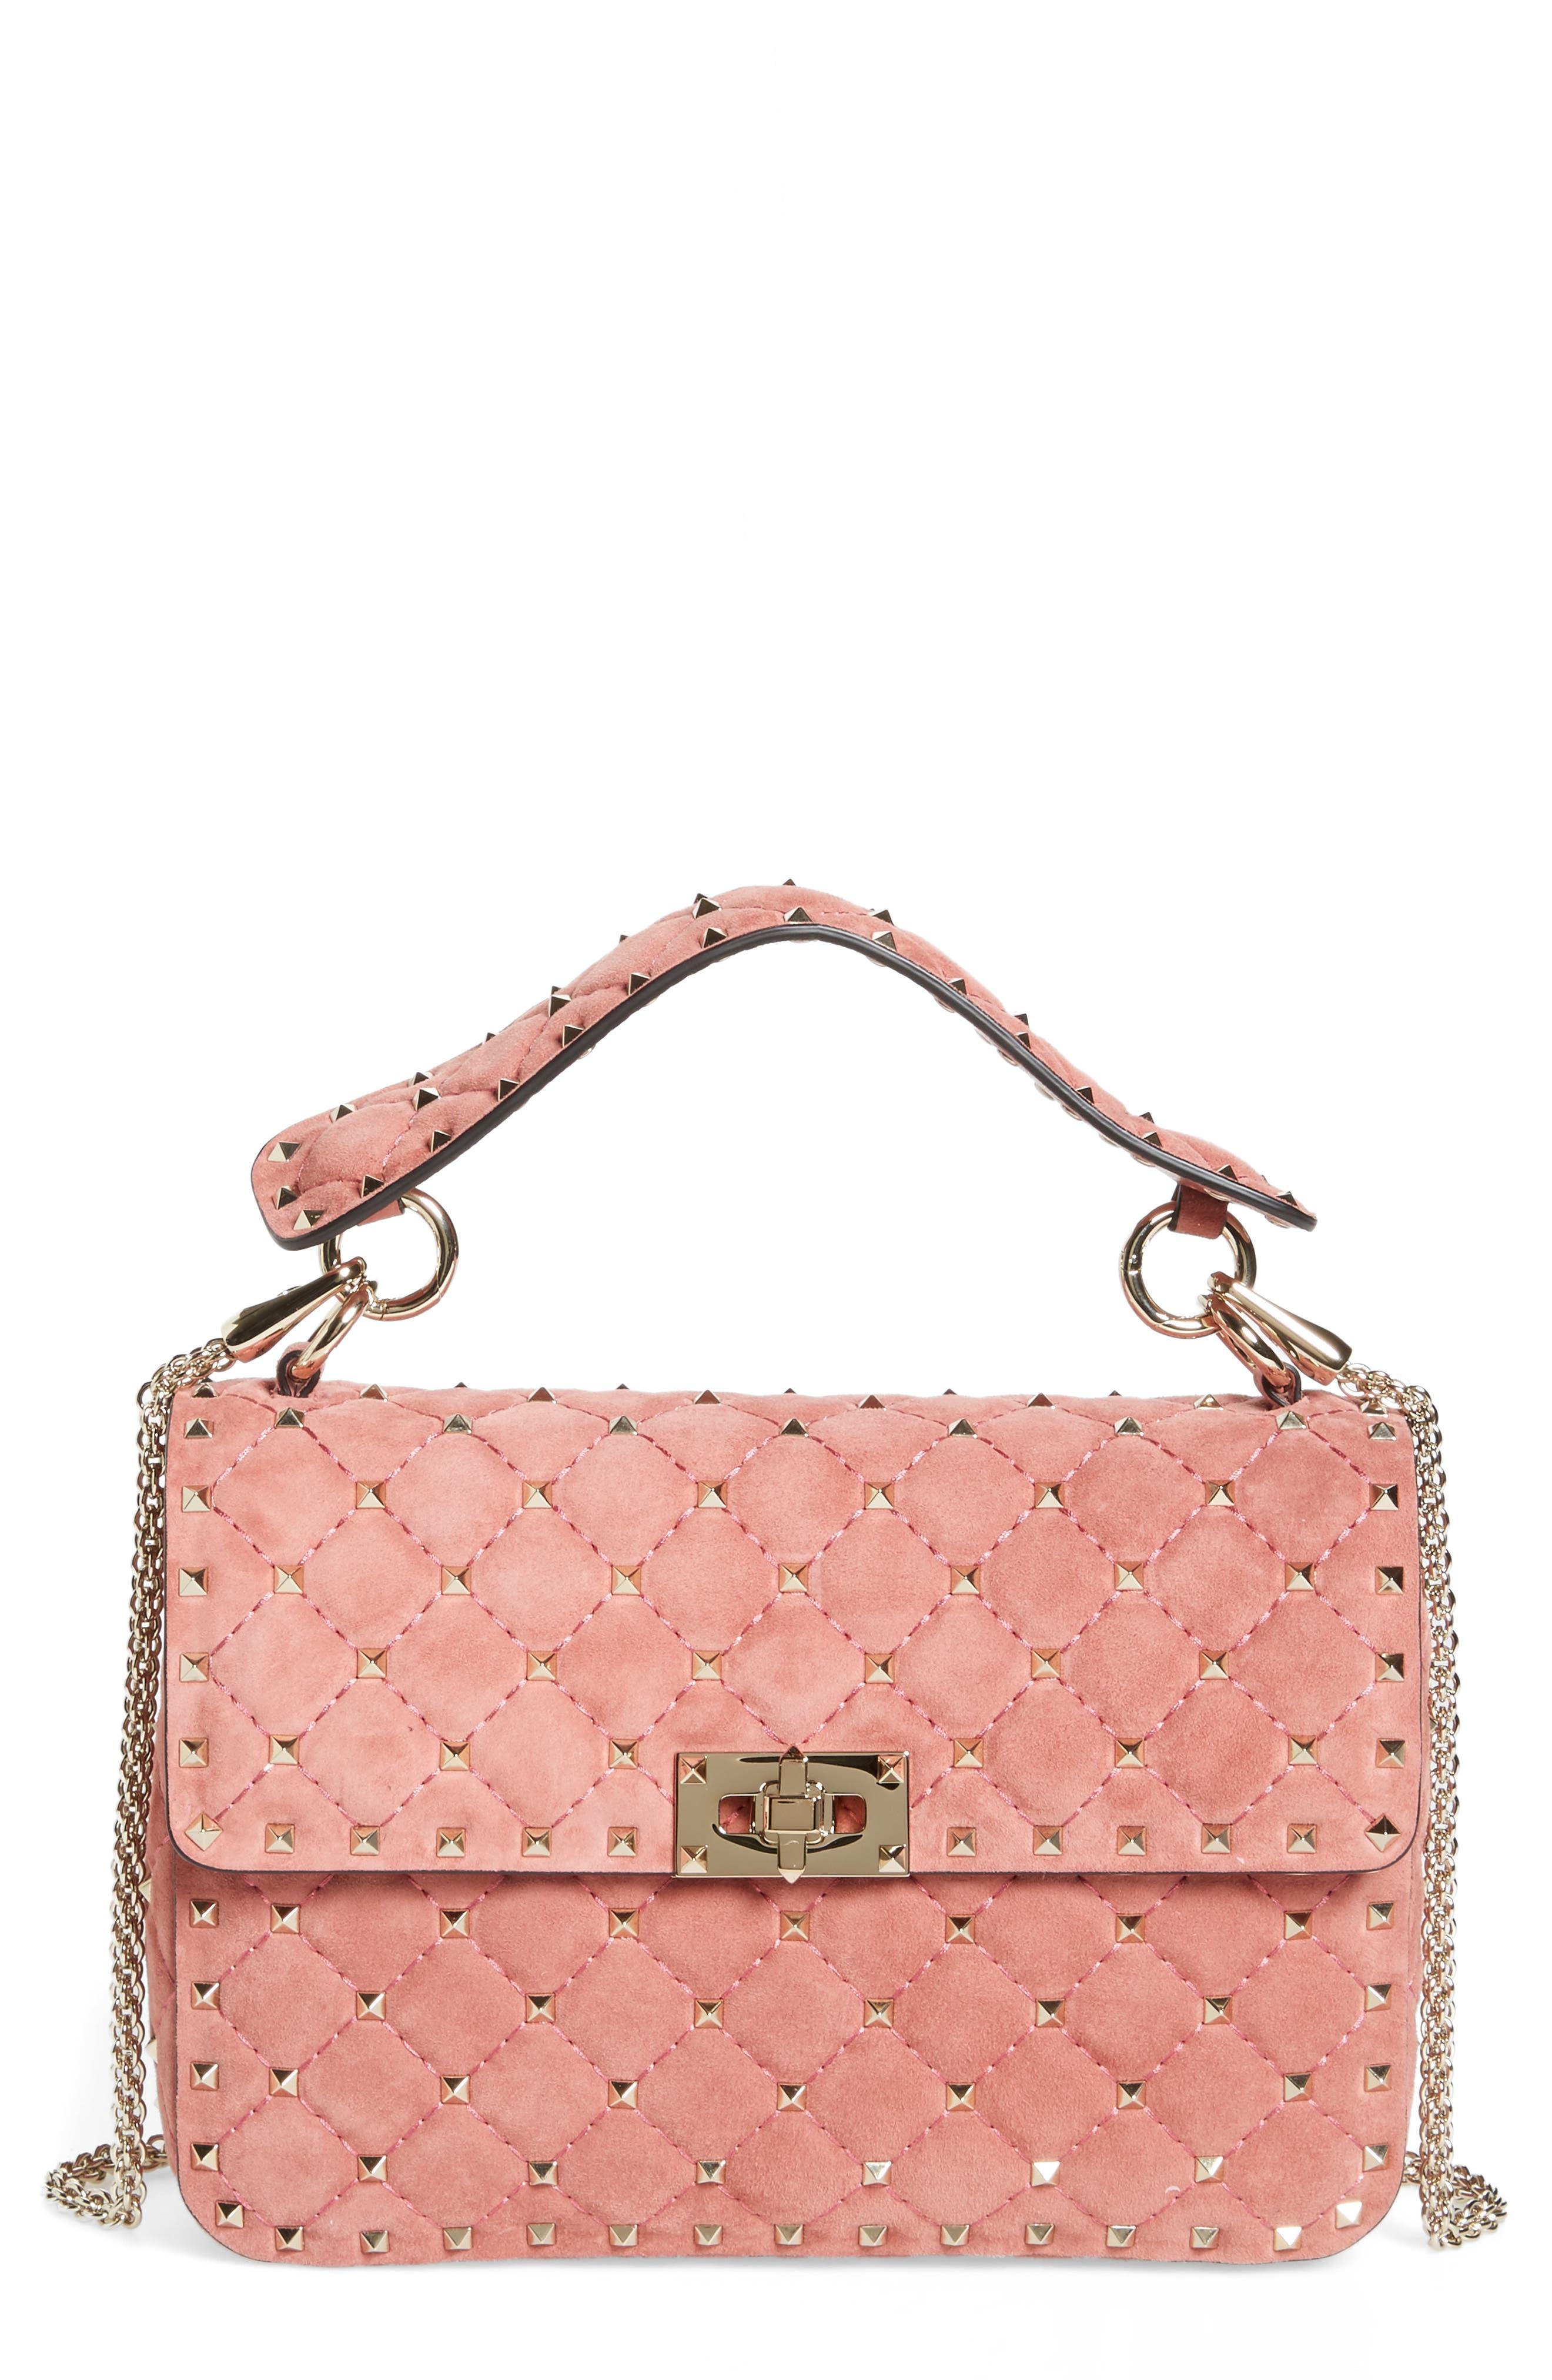 VALENTINO GARAVANI Rockstud Spike Leather Top Handle Crossbody Bag